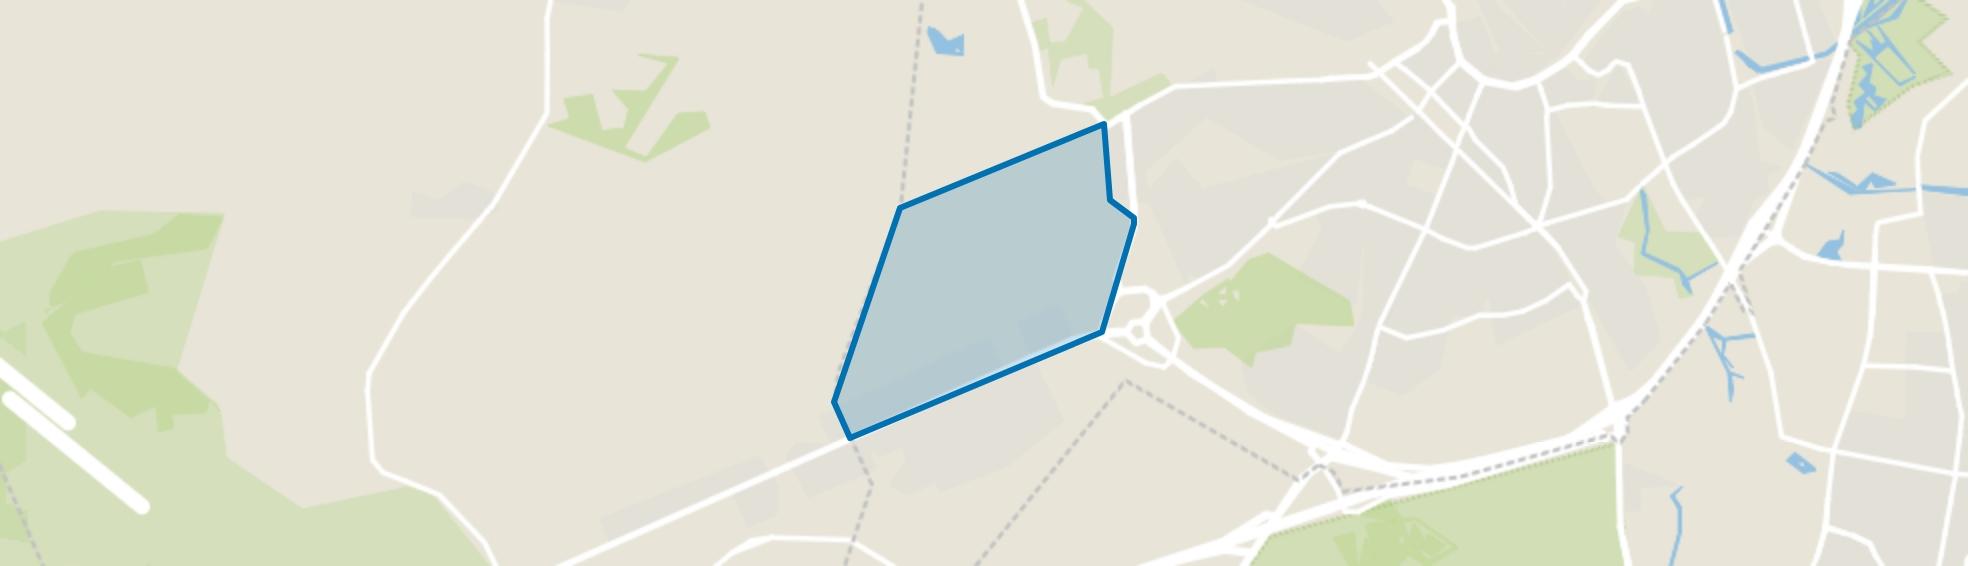 Vlasakkers, Amersfoort map